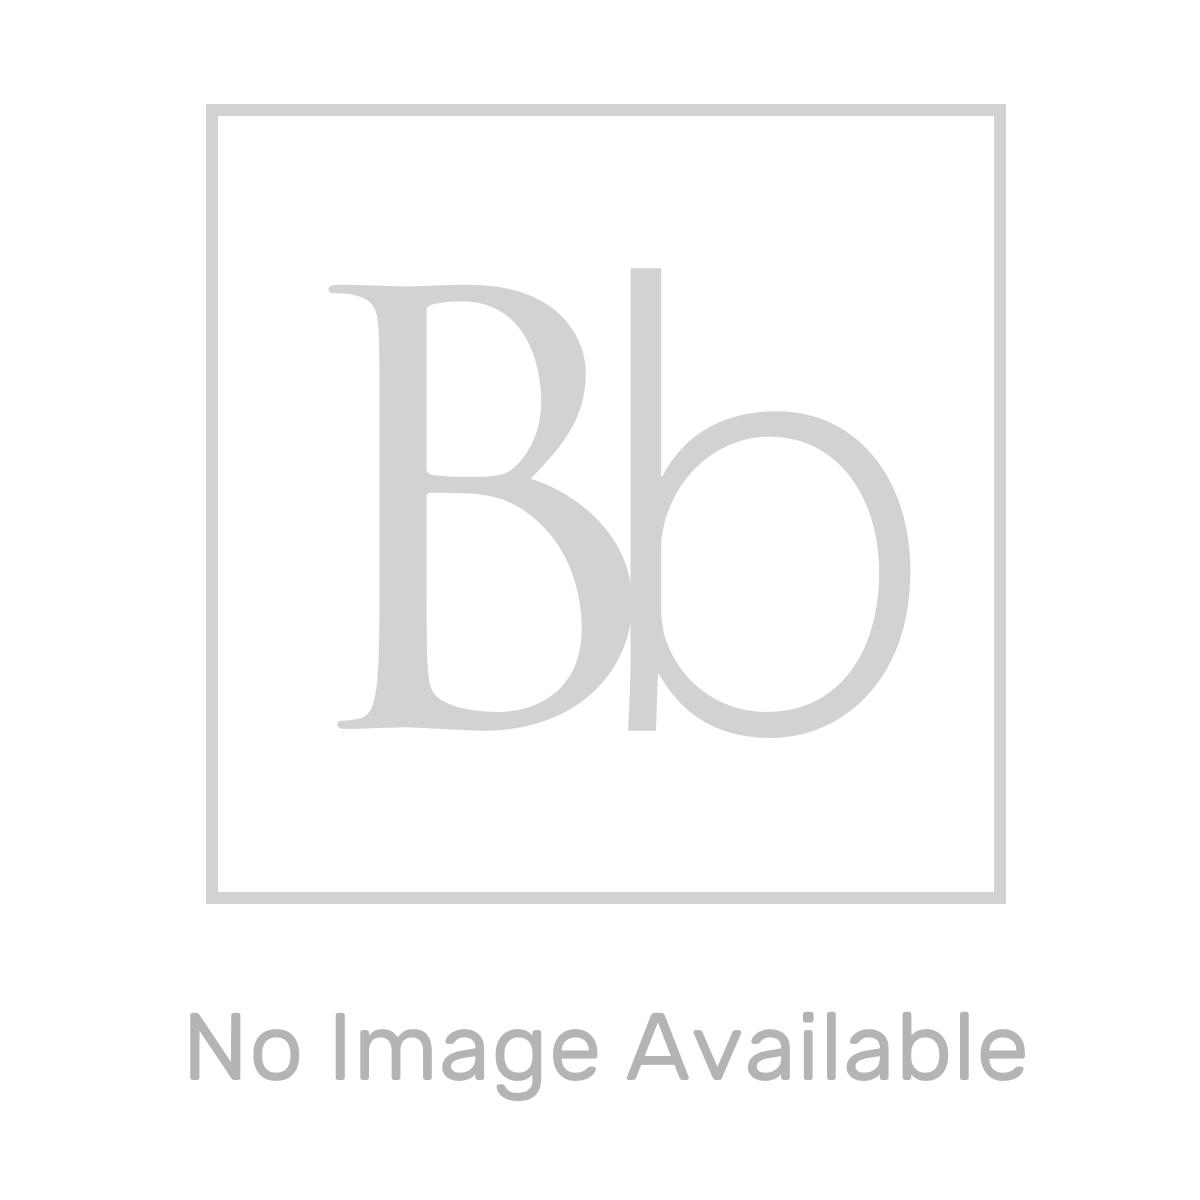 Aquadart Offset Quadrant 1000 x 800 Shower Tray Left Handed Line Drawing